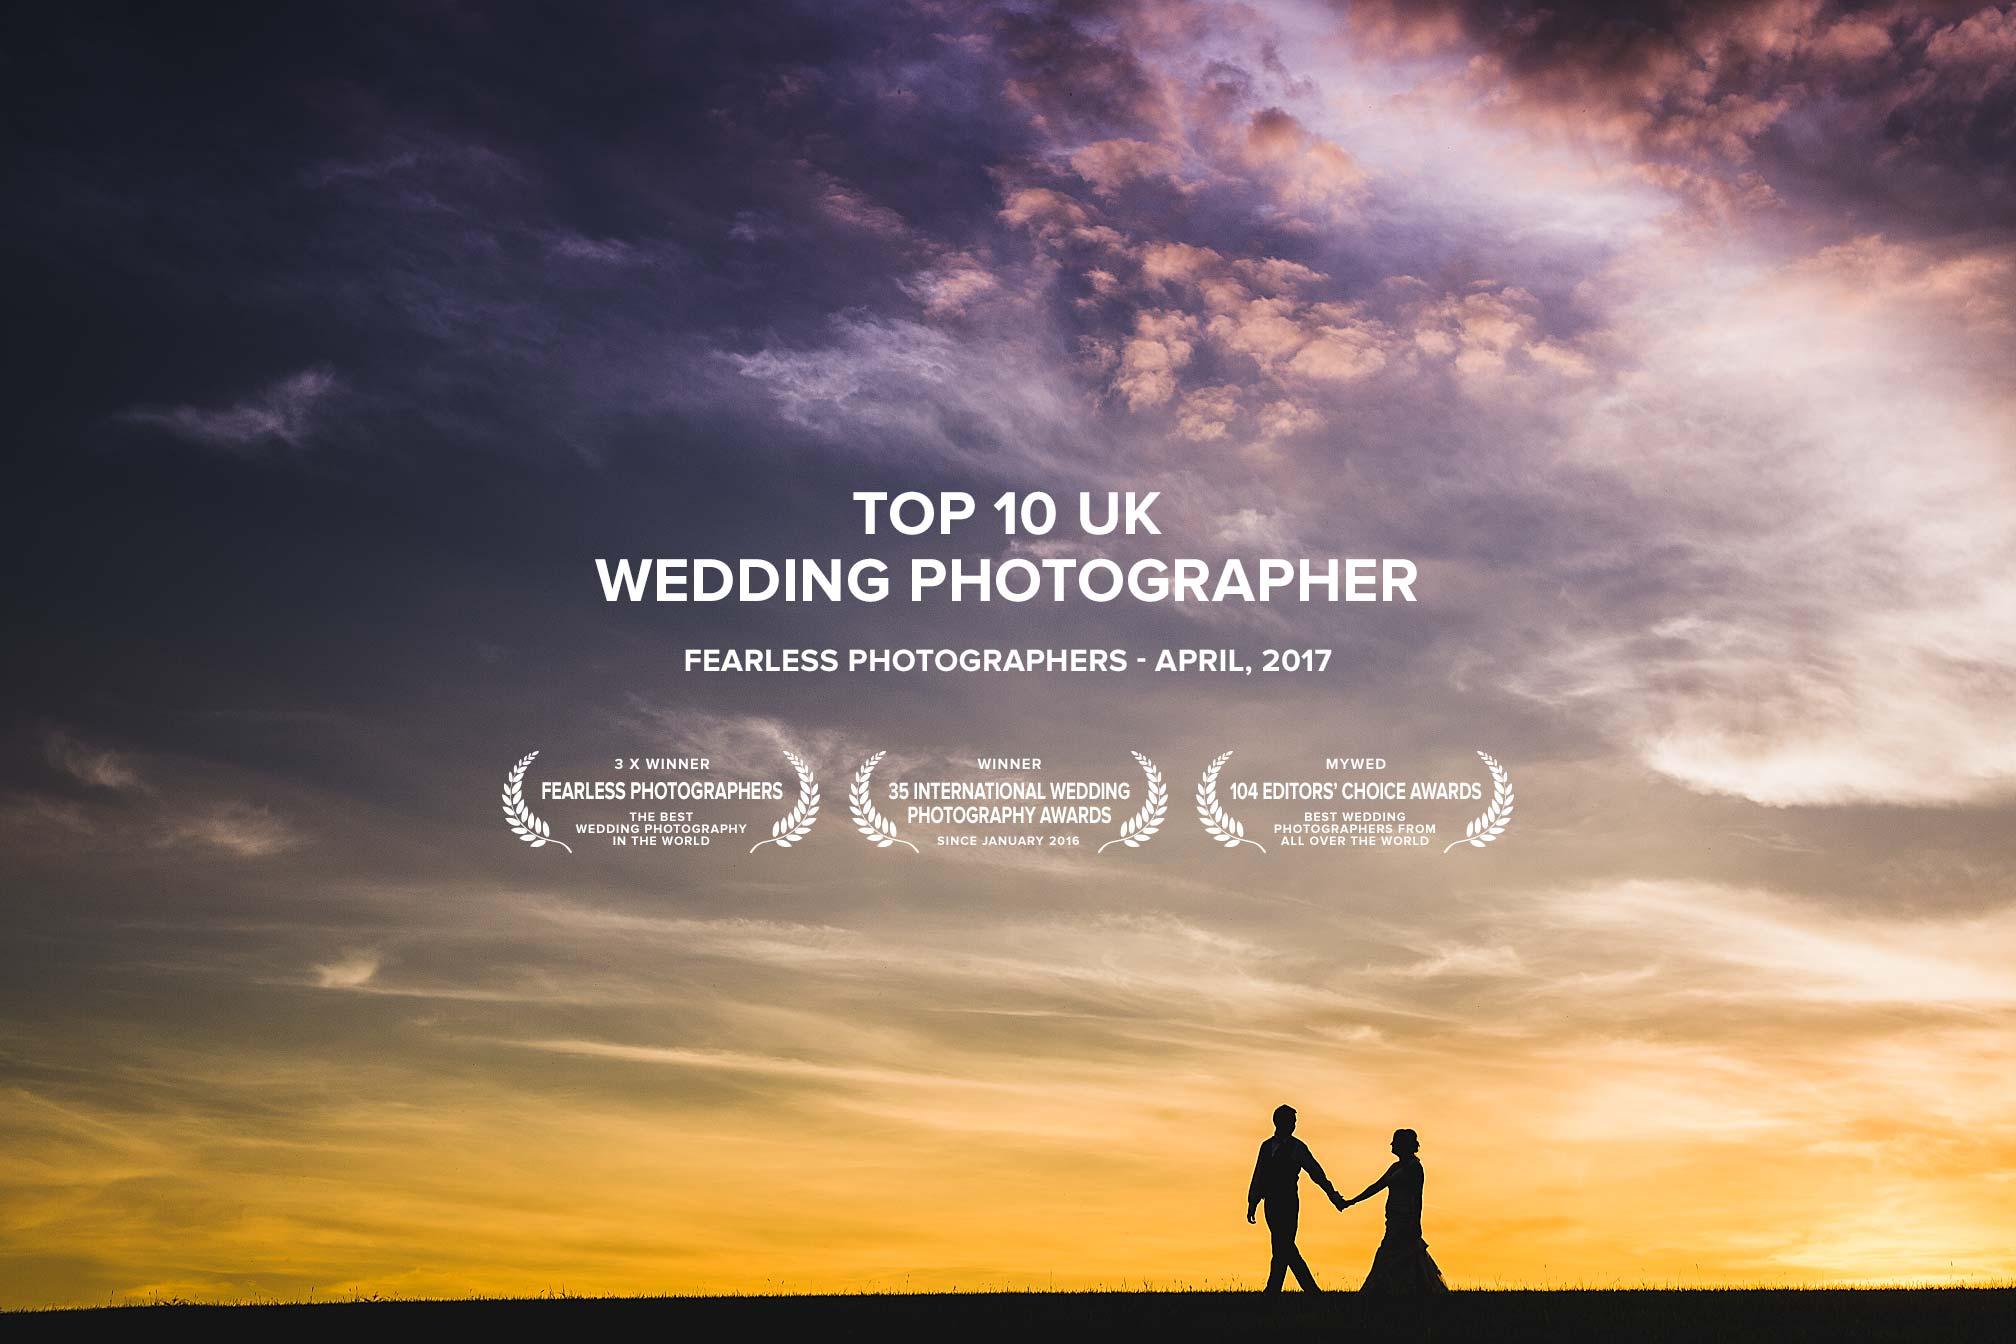 Top 10 UK Award Winning Wedding Photographer - Fearless Photographers